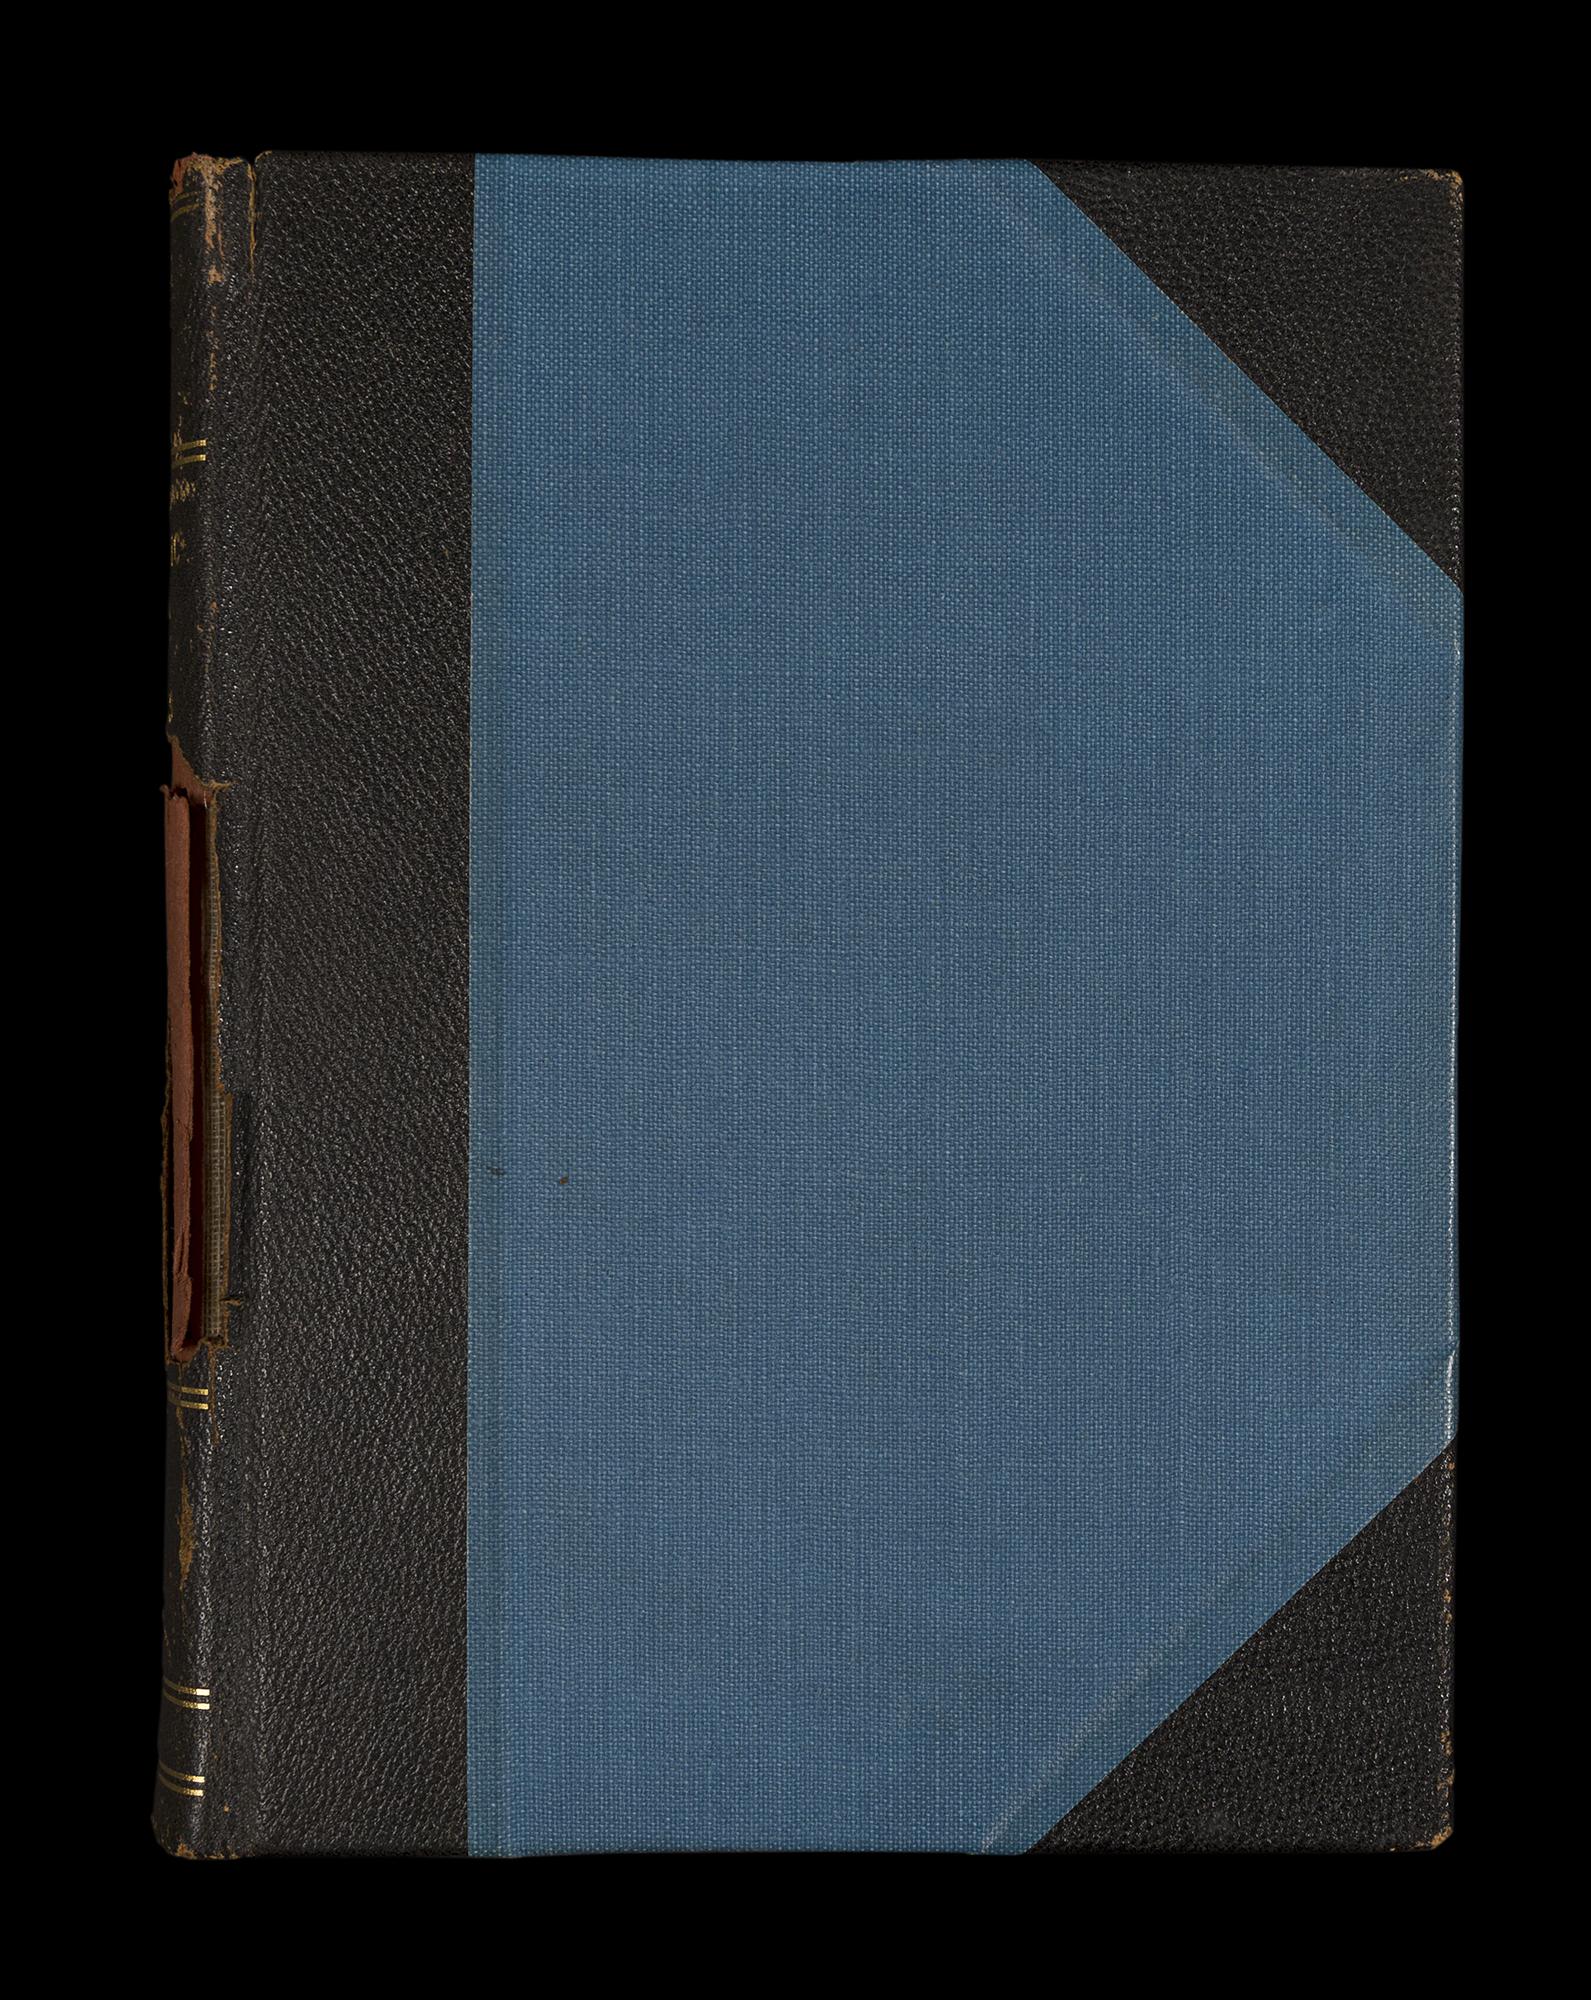 LAPO_ProgramBook_Cover_1924-1925.jpg